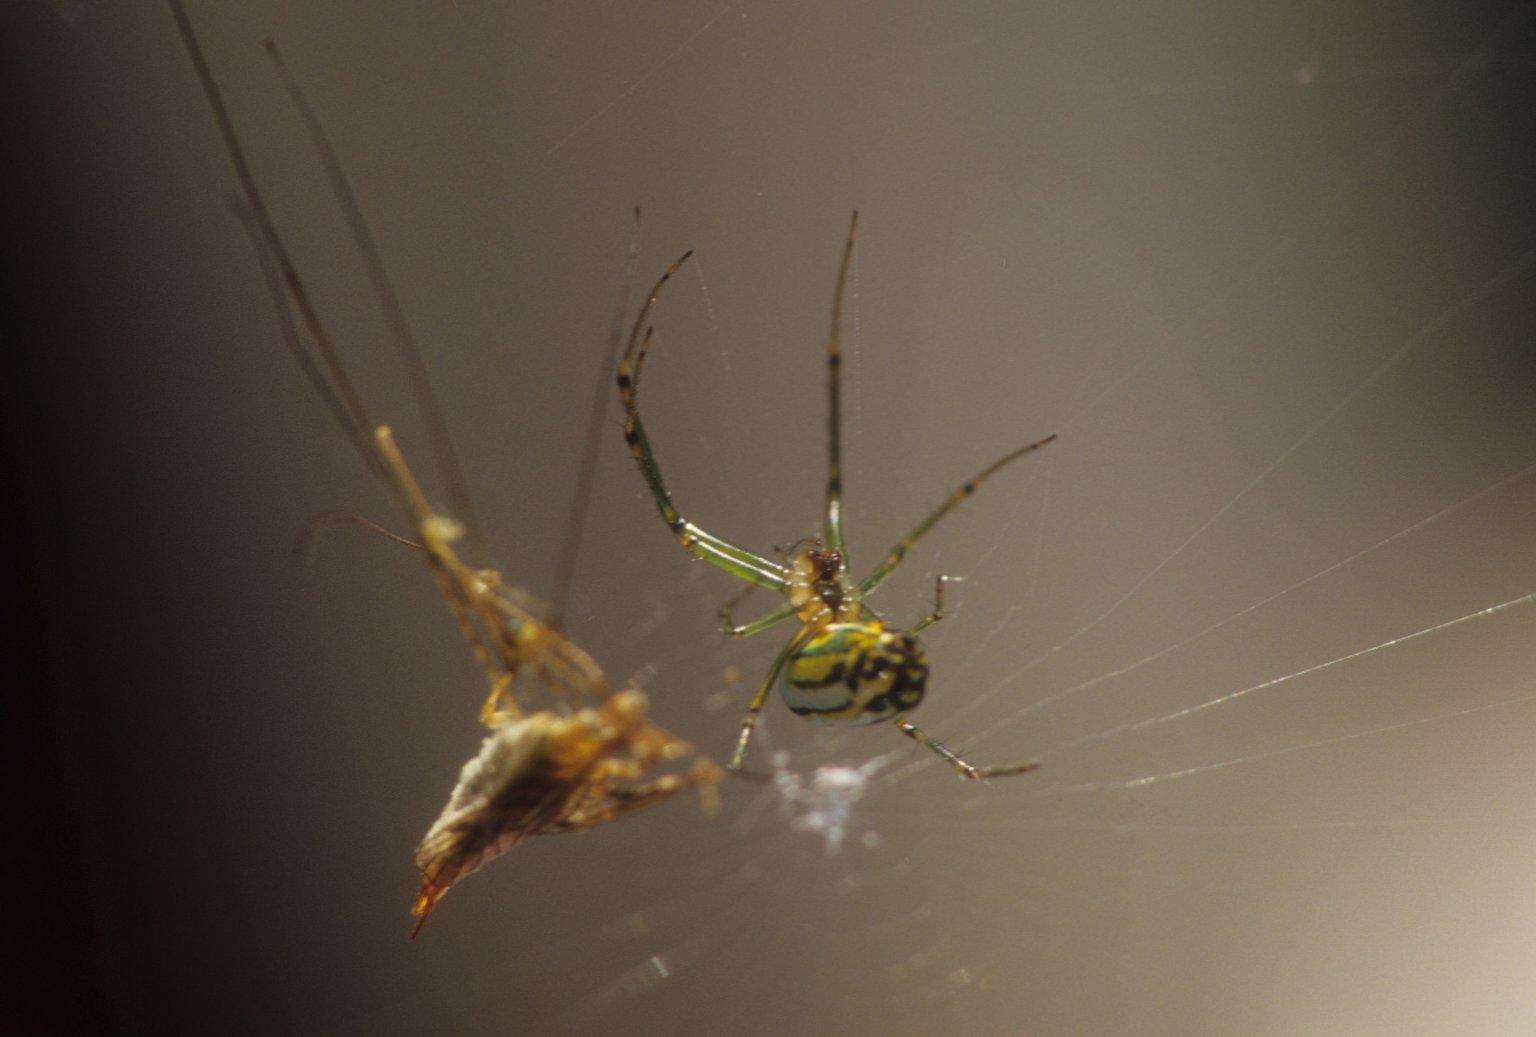 Orchard spider Leucauge venusta (Tetragnathidae)